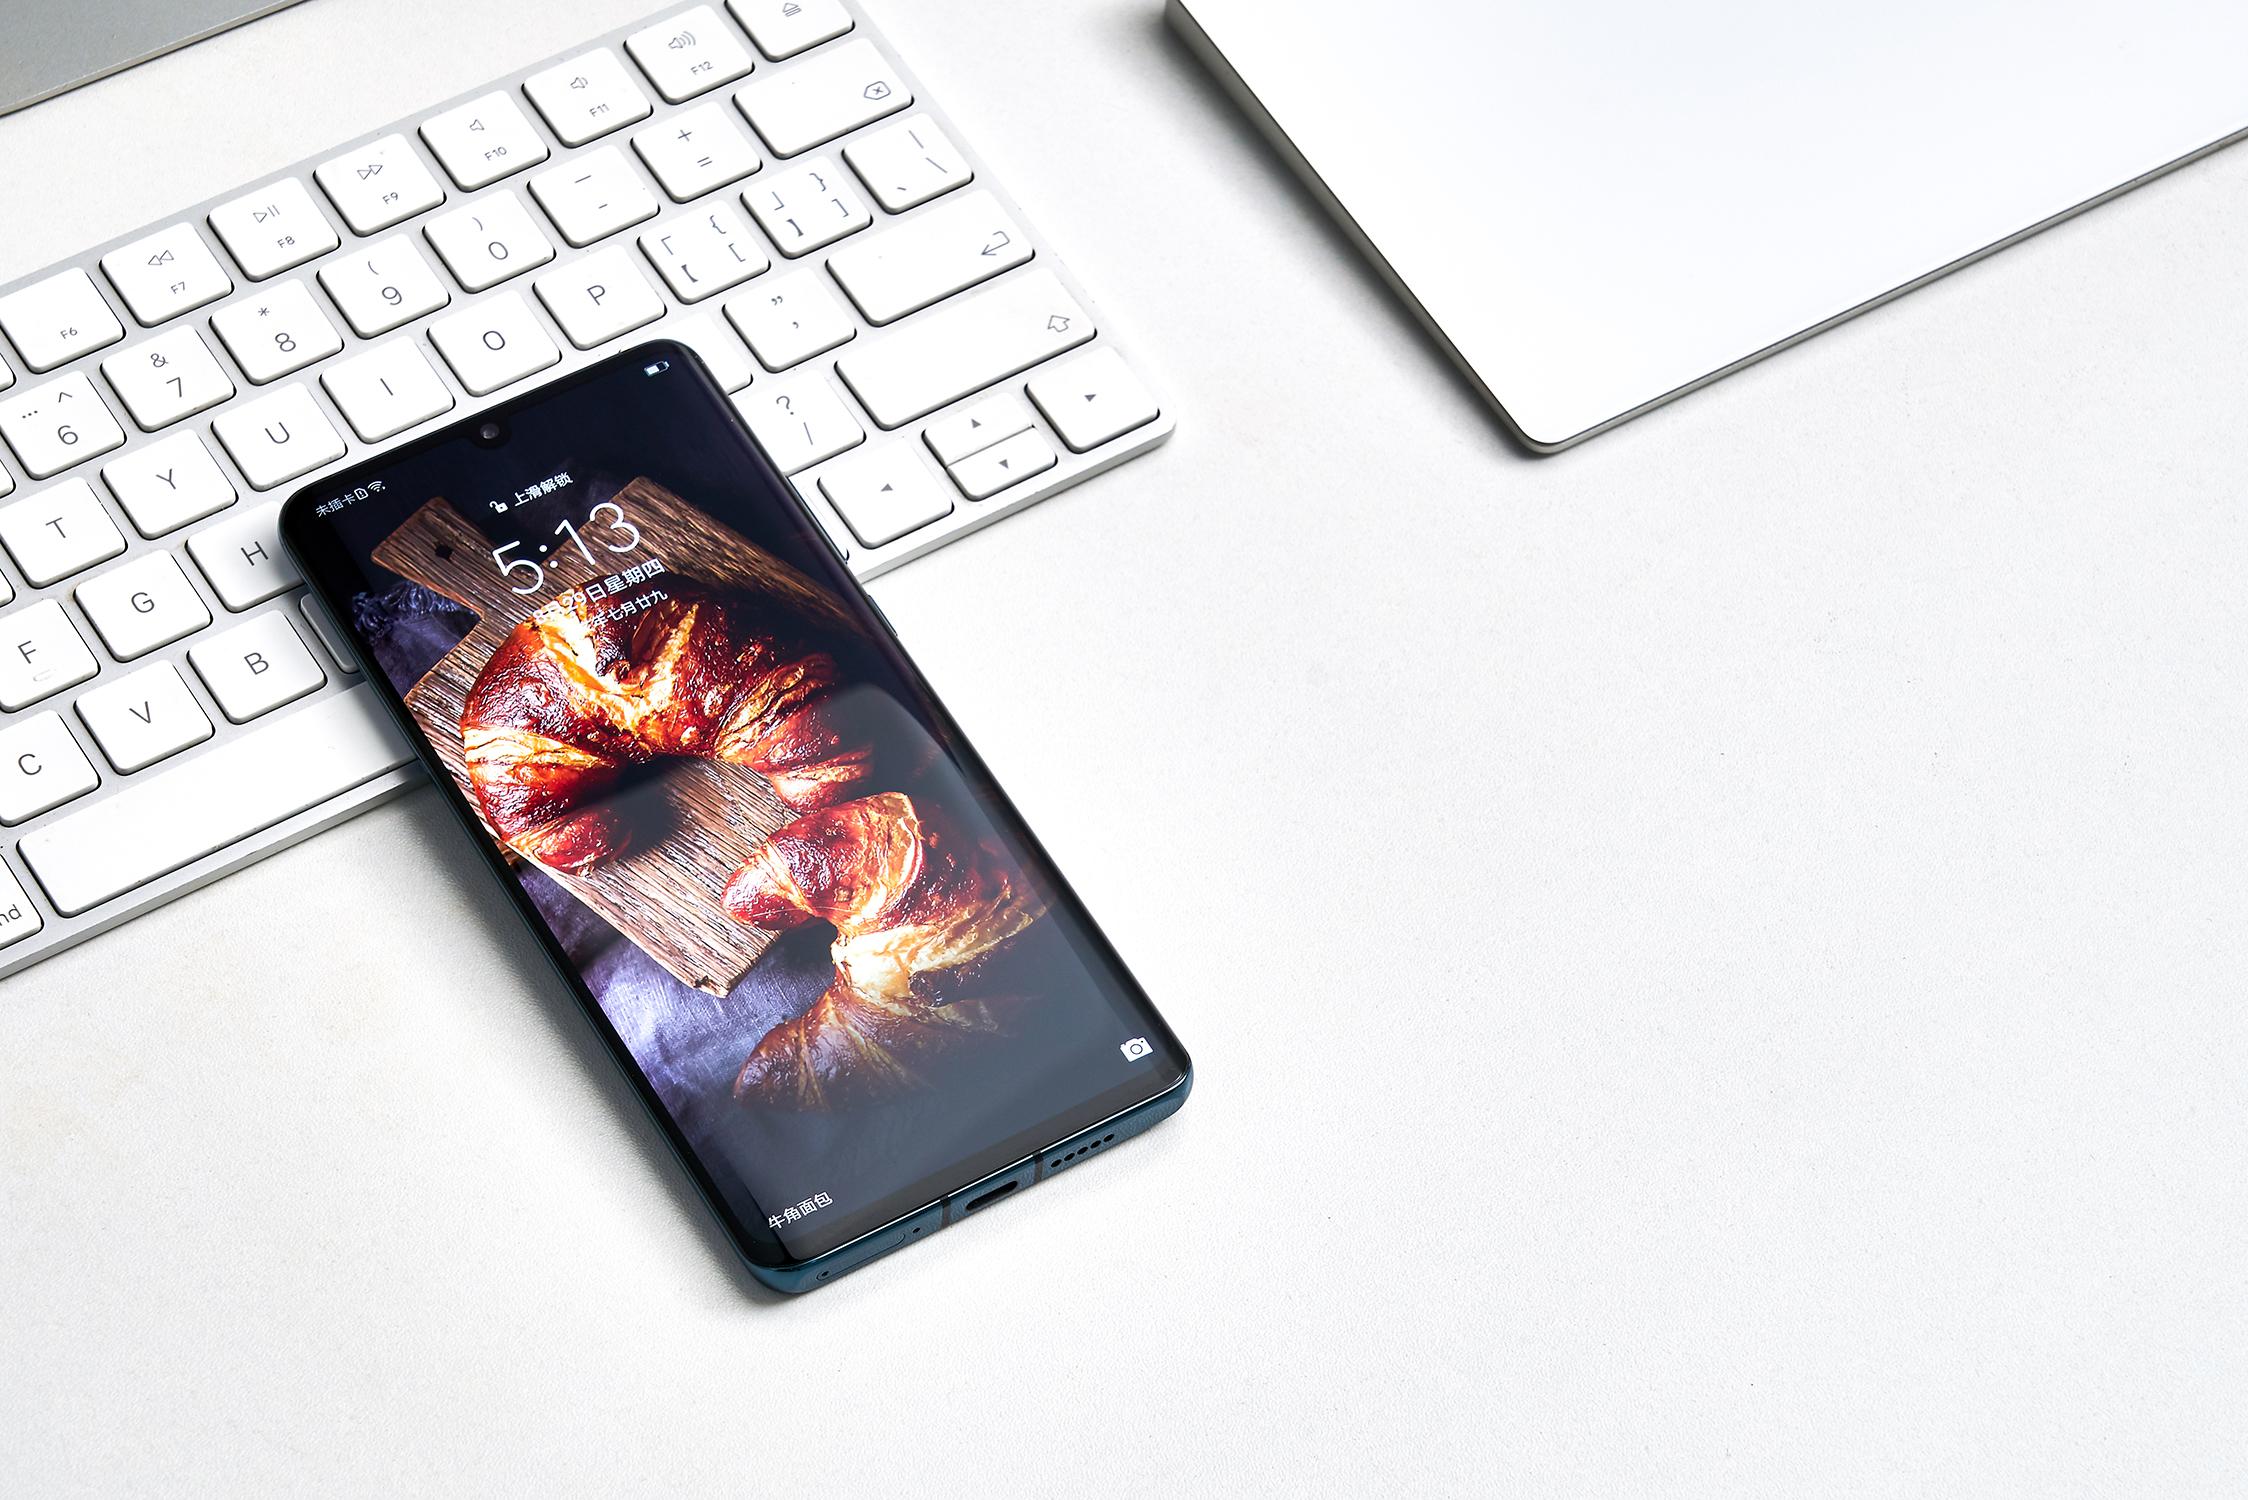 The New P30 Pro墨玉蓝图赏:拼接设计,率先支持EMUI10